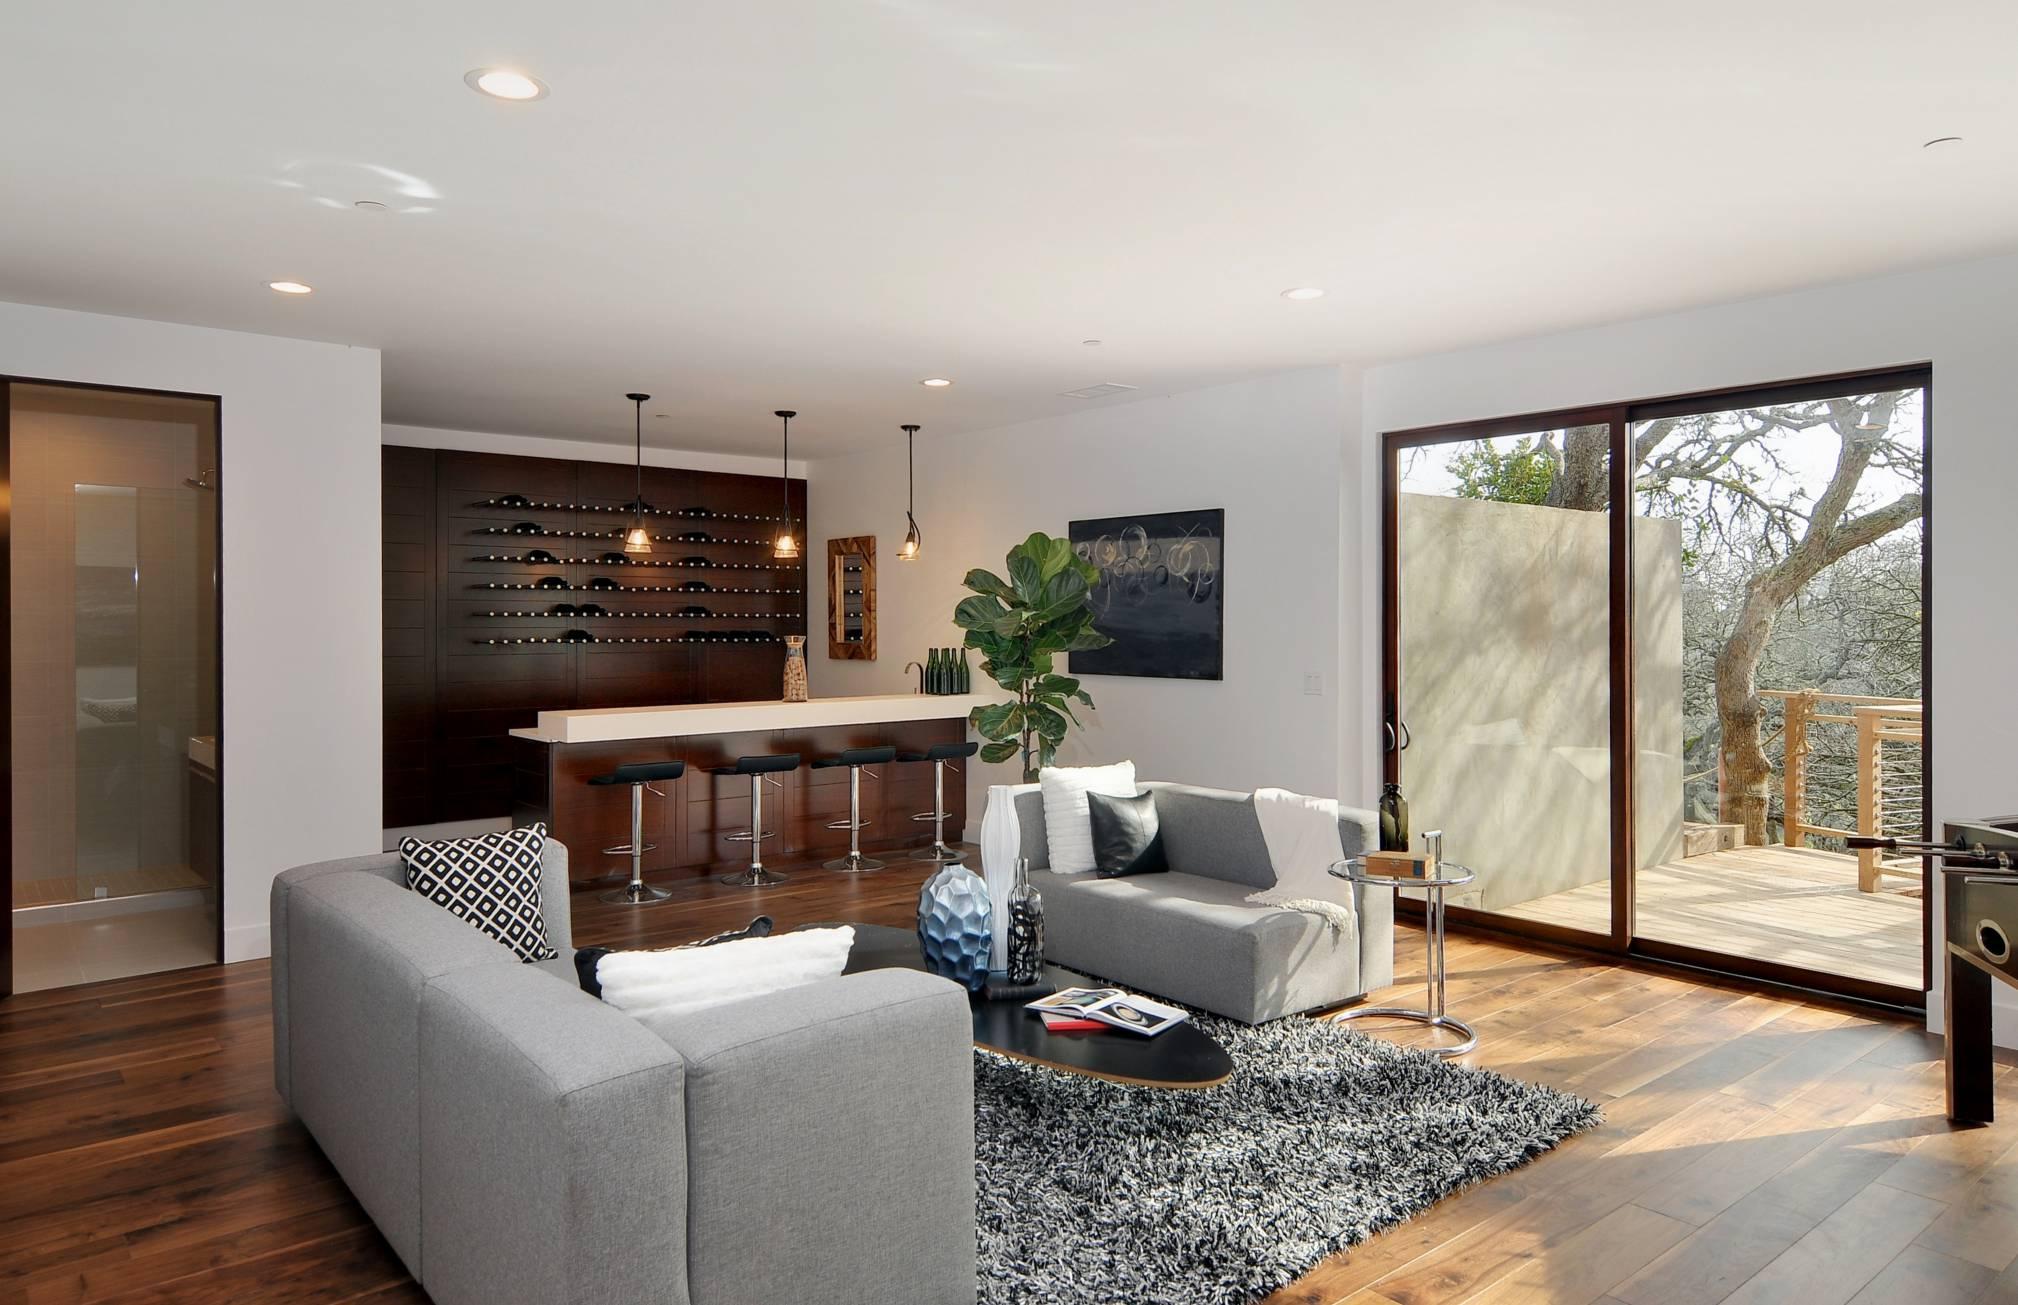 Los Altos Hills Basement bar seating area